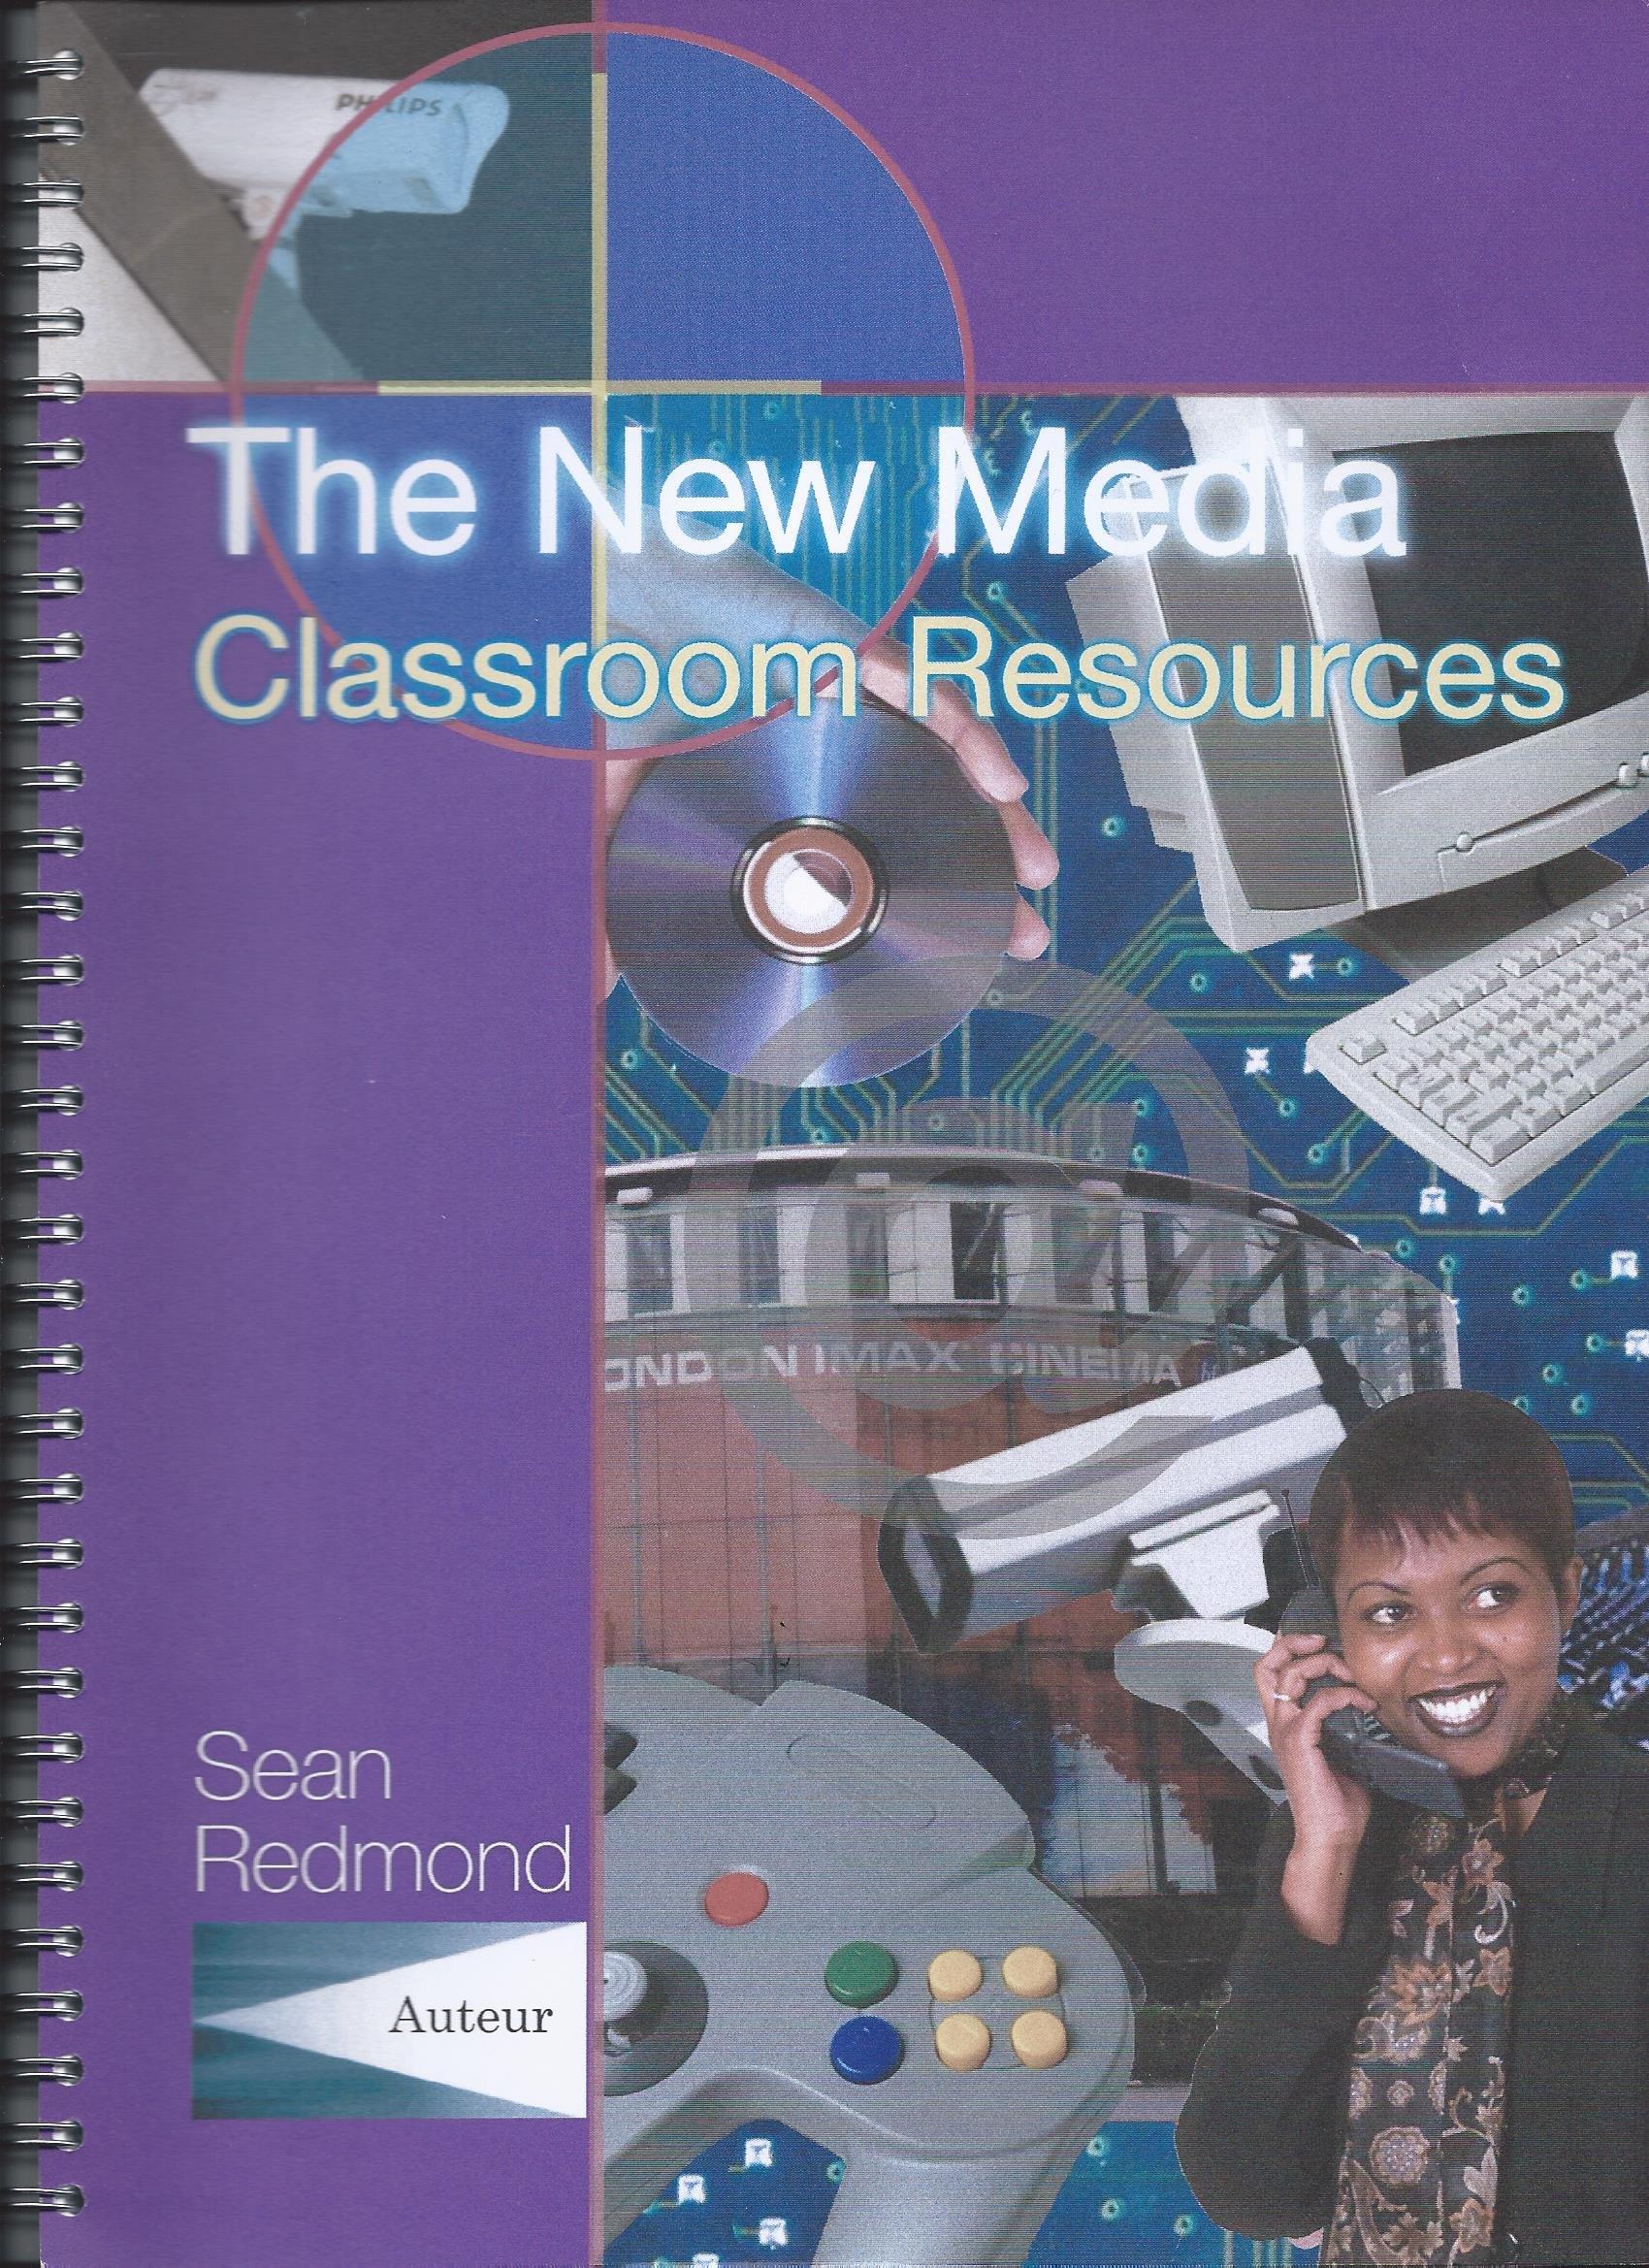 The New Media: Classroom Resources ebook